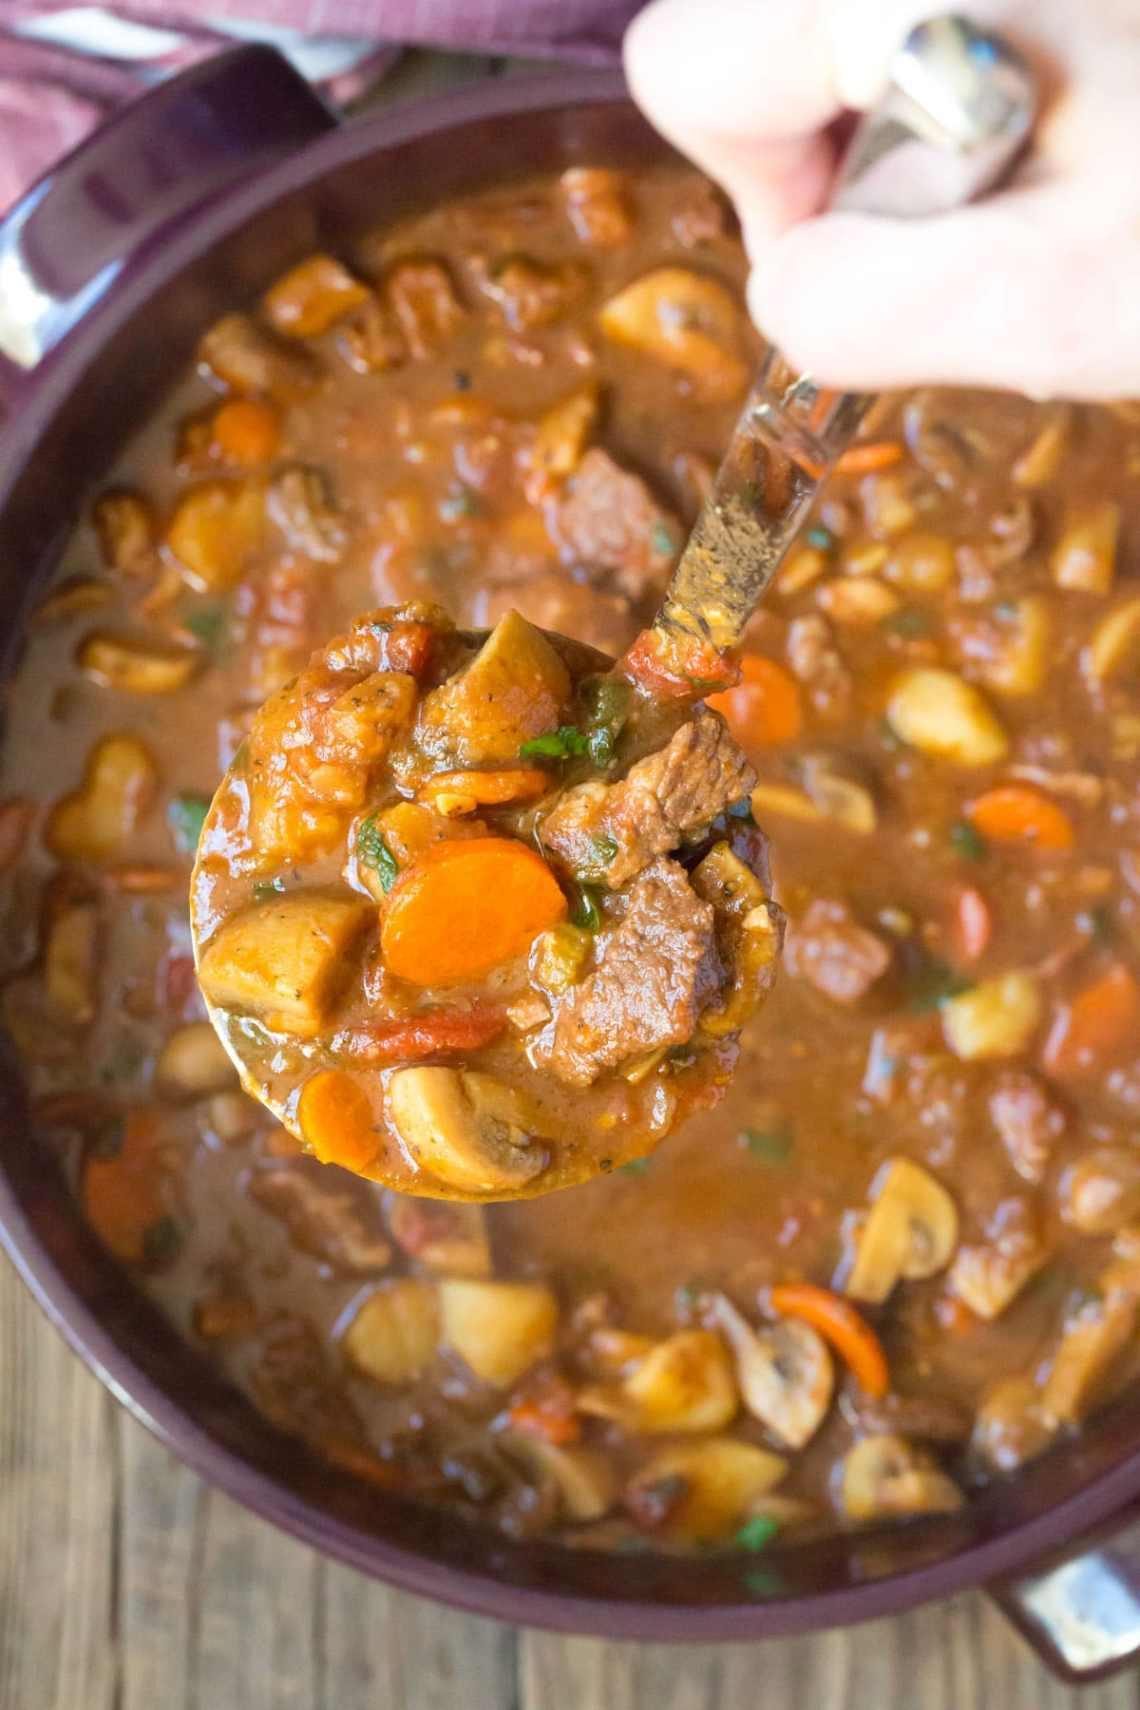 The BEST Beef Stew Recipe (3 Ways!) + Video - A Spicy ...